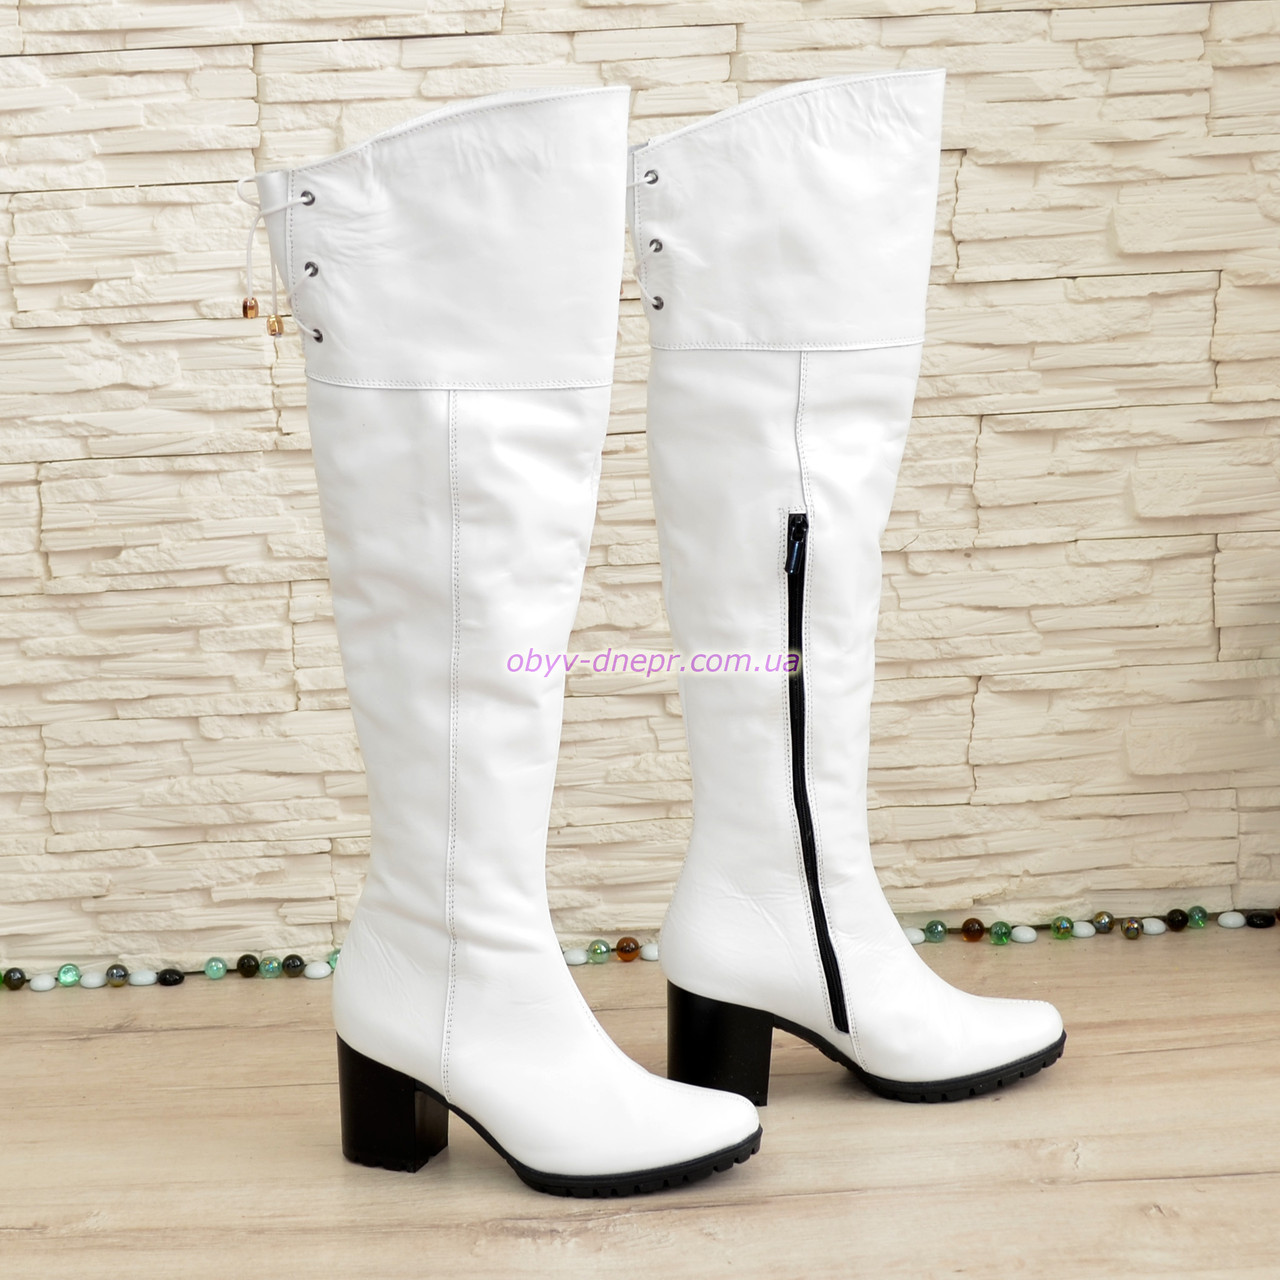 Ботфорты   кожаные на каблуке. Белый цвет.